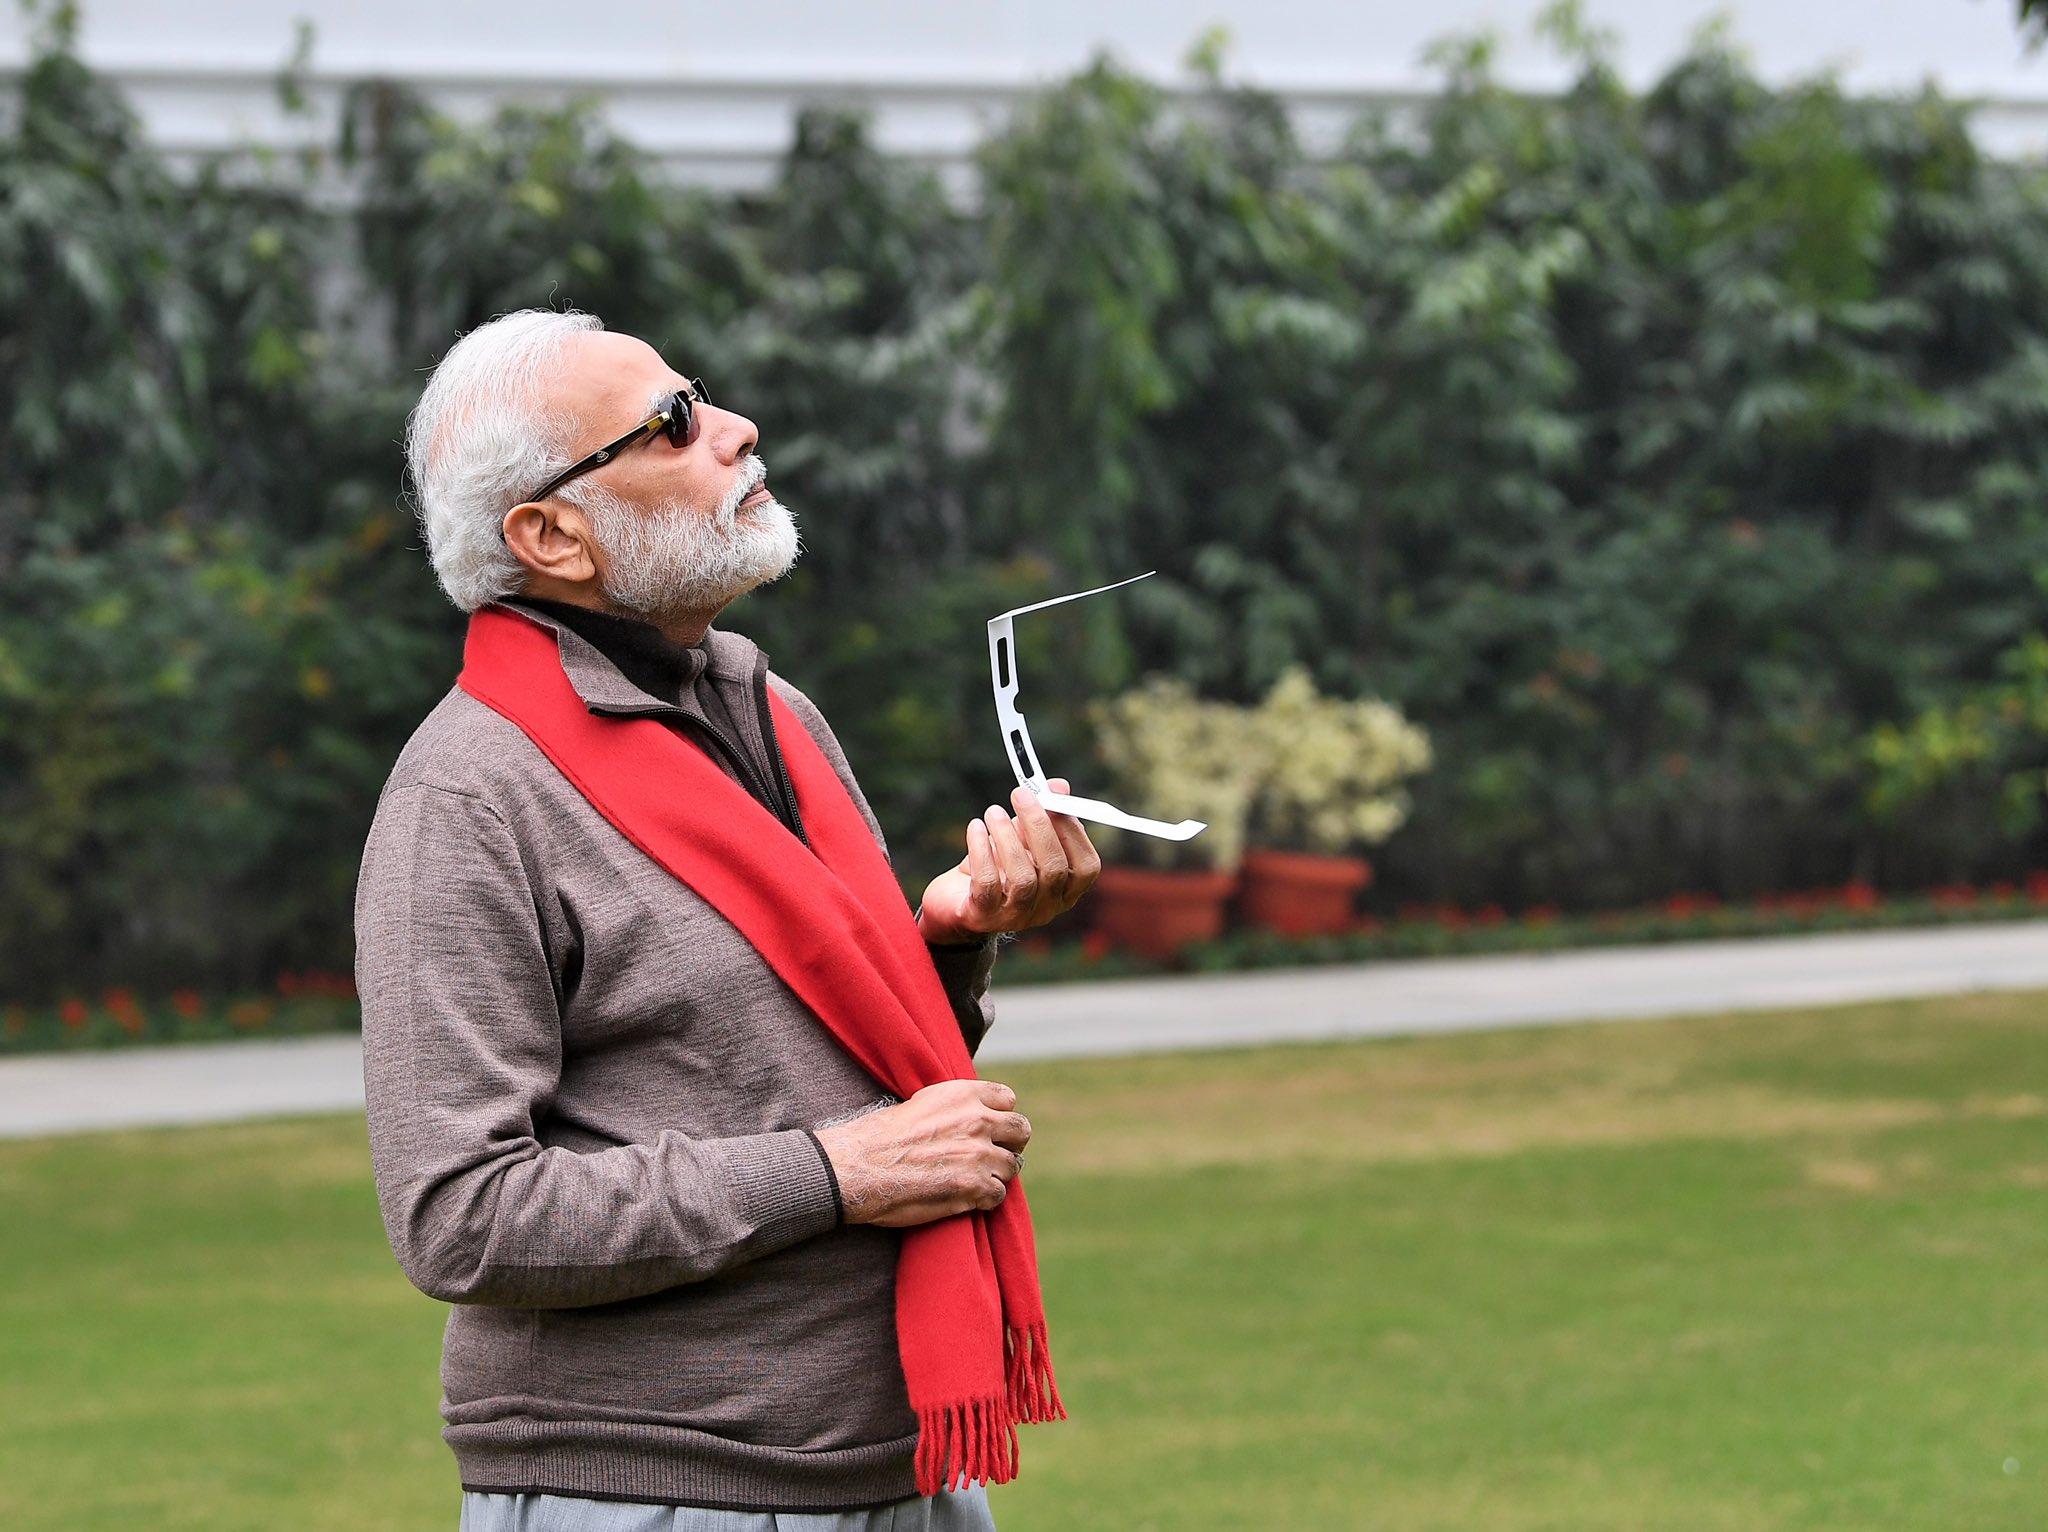 Narendra Modi On Twitter Like Many Indians I Was Enthusiastic